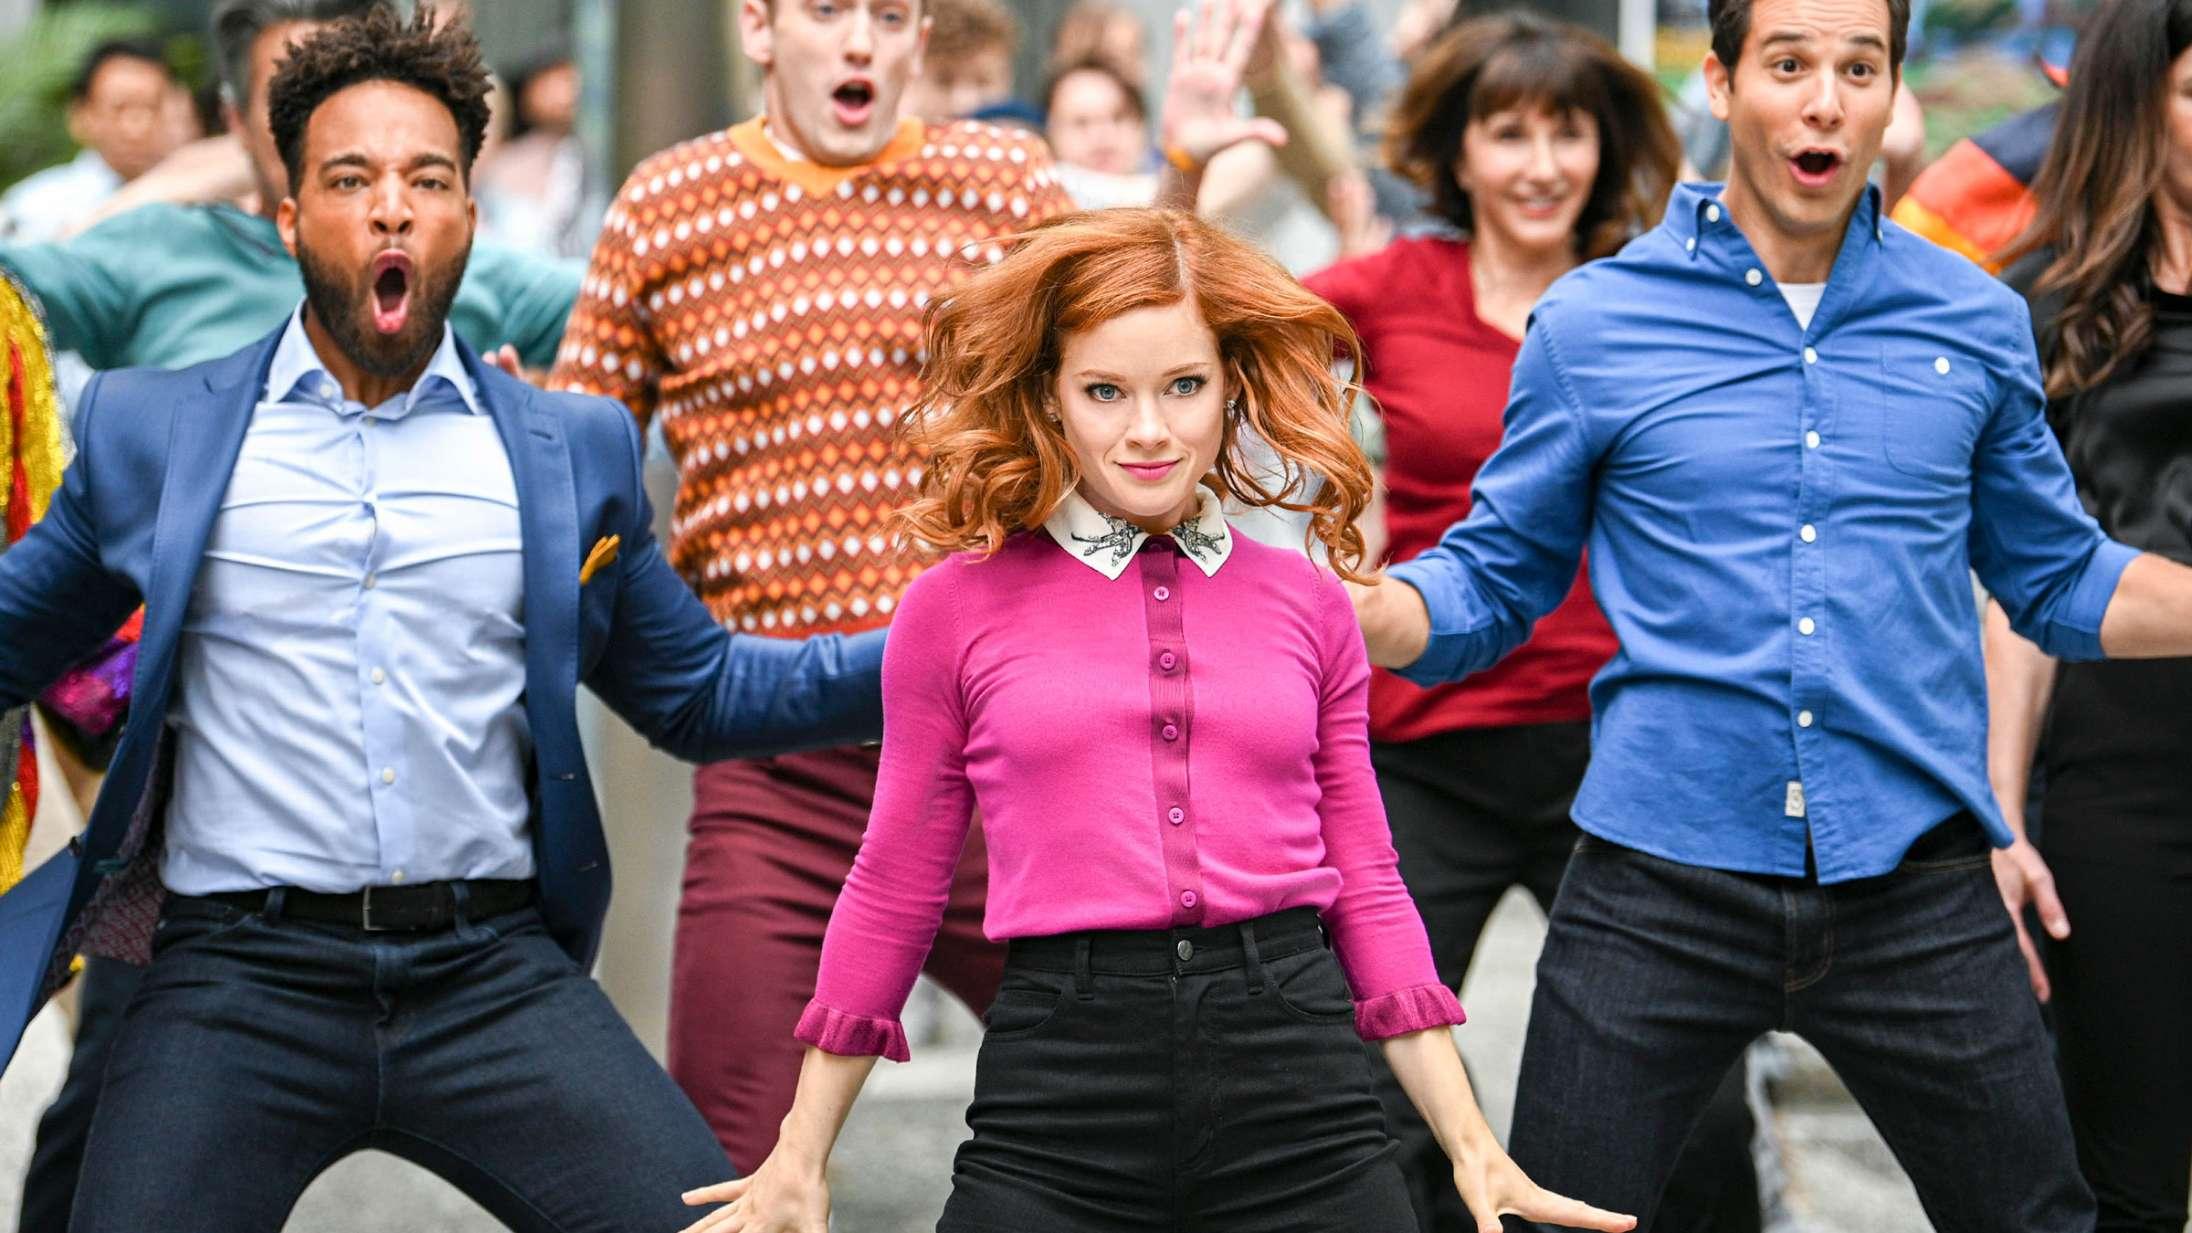 'Zoey's Extraordinary Playlist': Skøn musicalserie kan endelig ses i Danmark – og vækker både grin og gråd